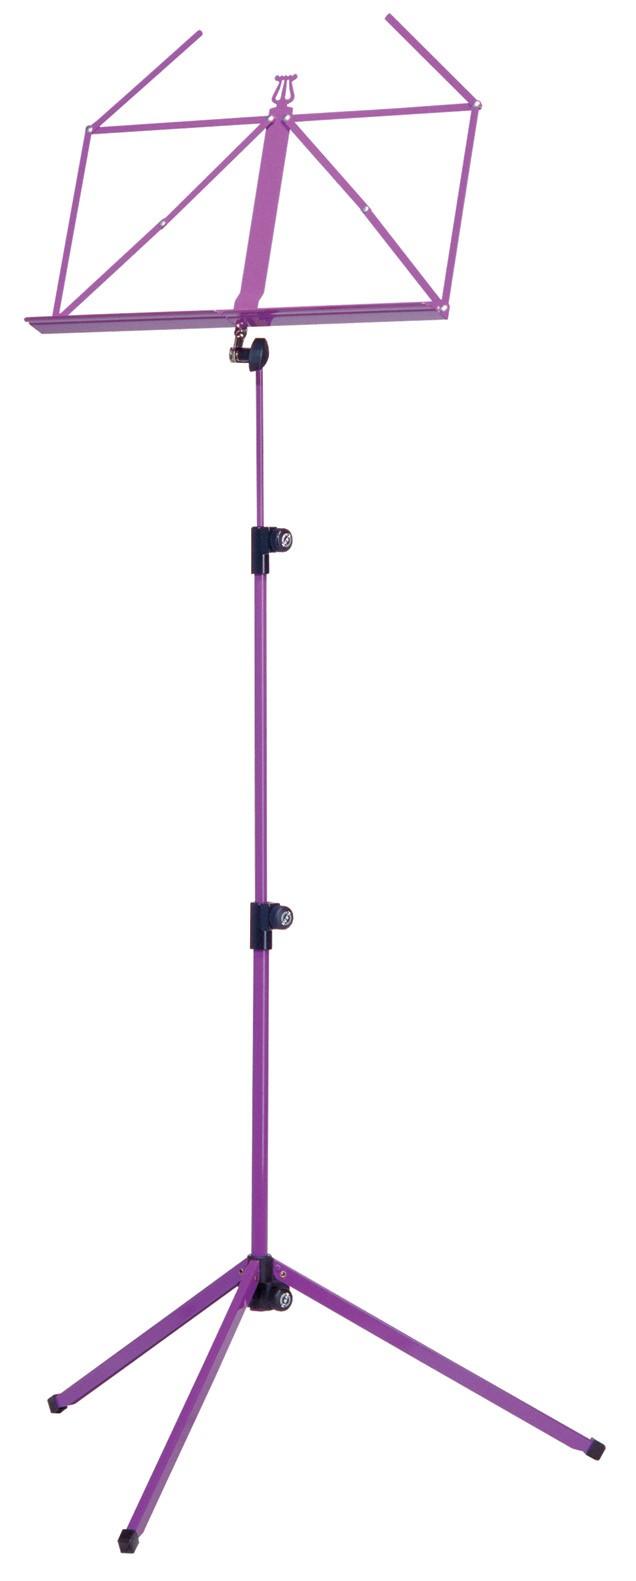 Konig & Meyer 100/1 Music Stand - Lilac